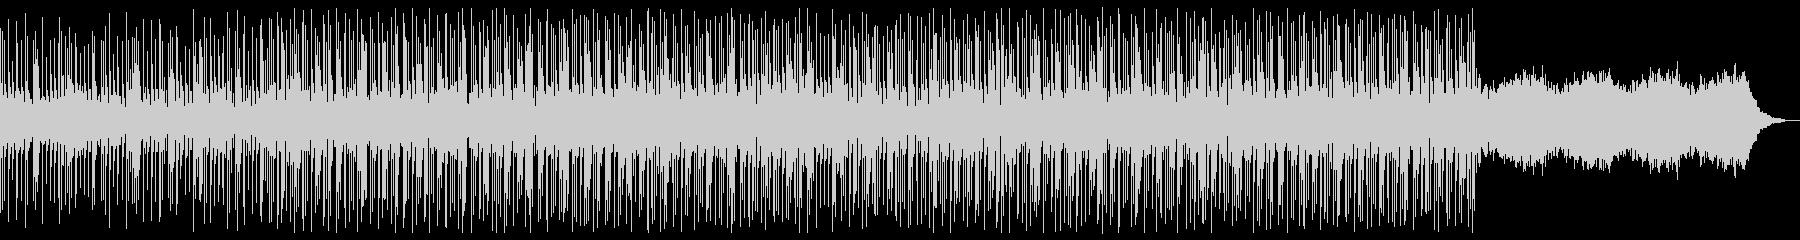 Baseless version's unreproduced waveform